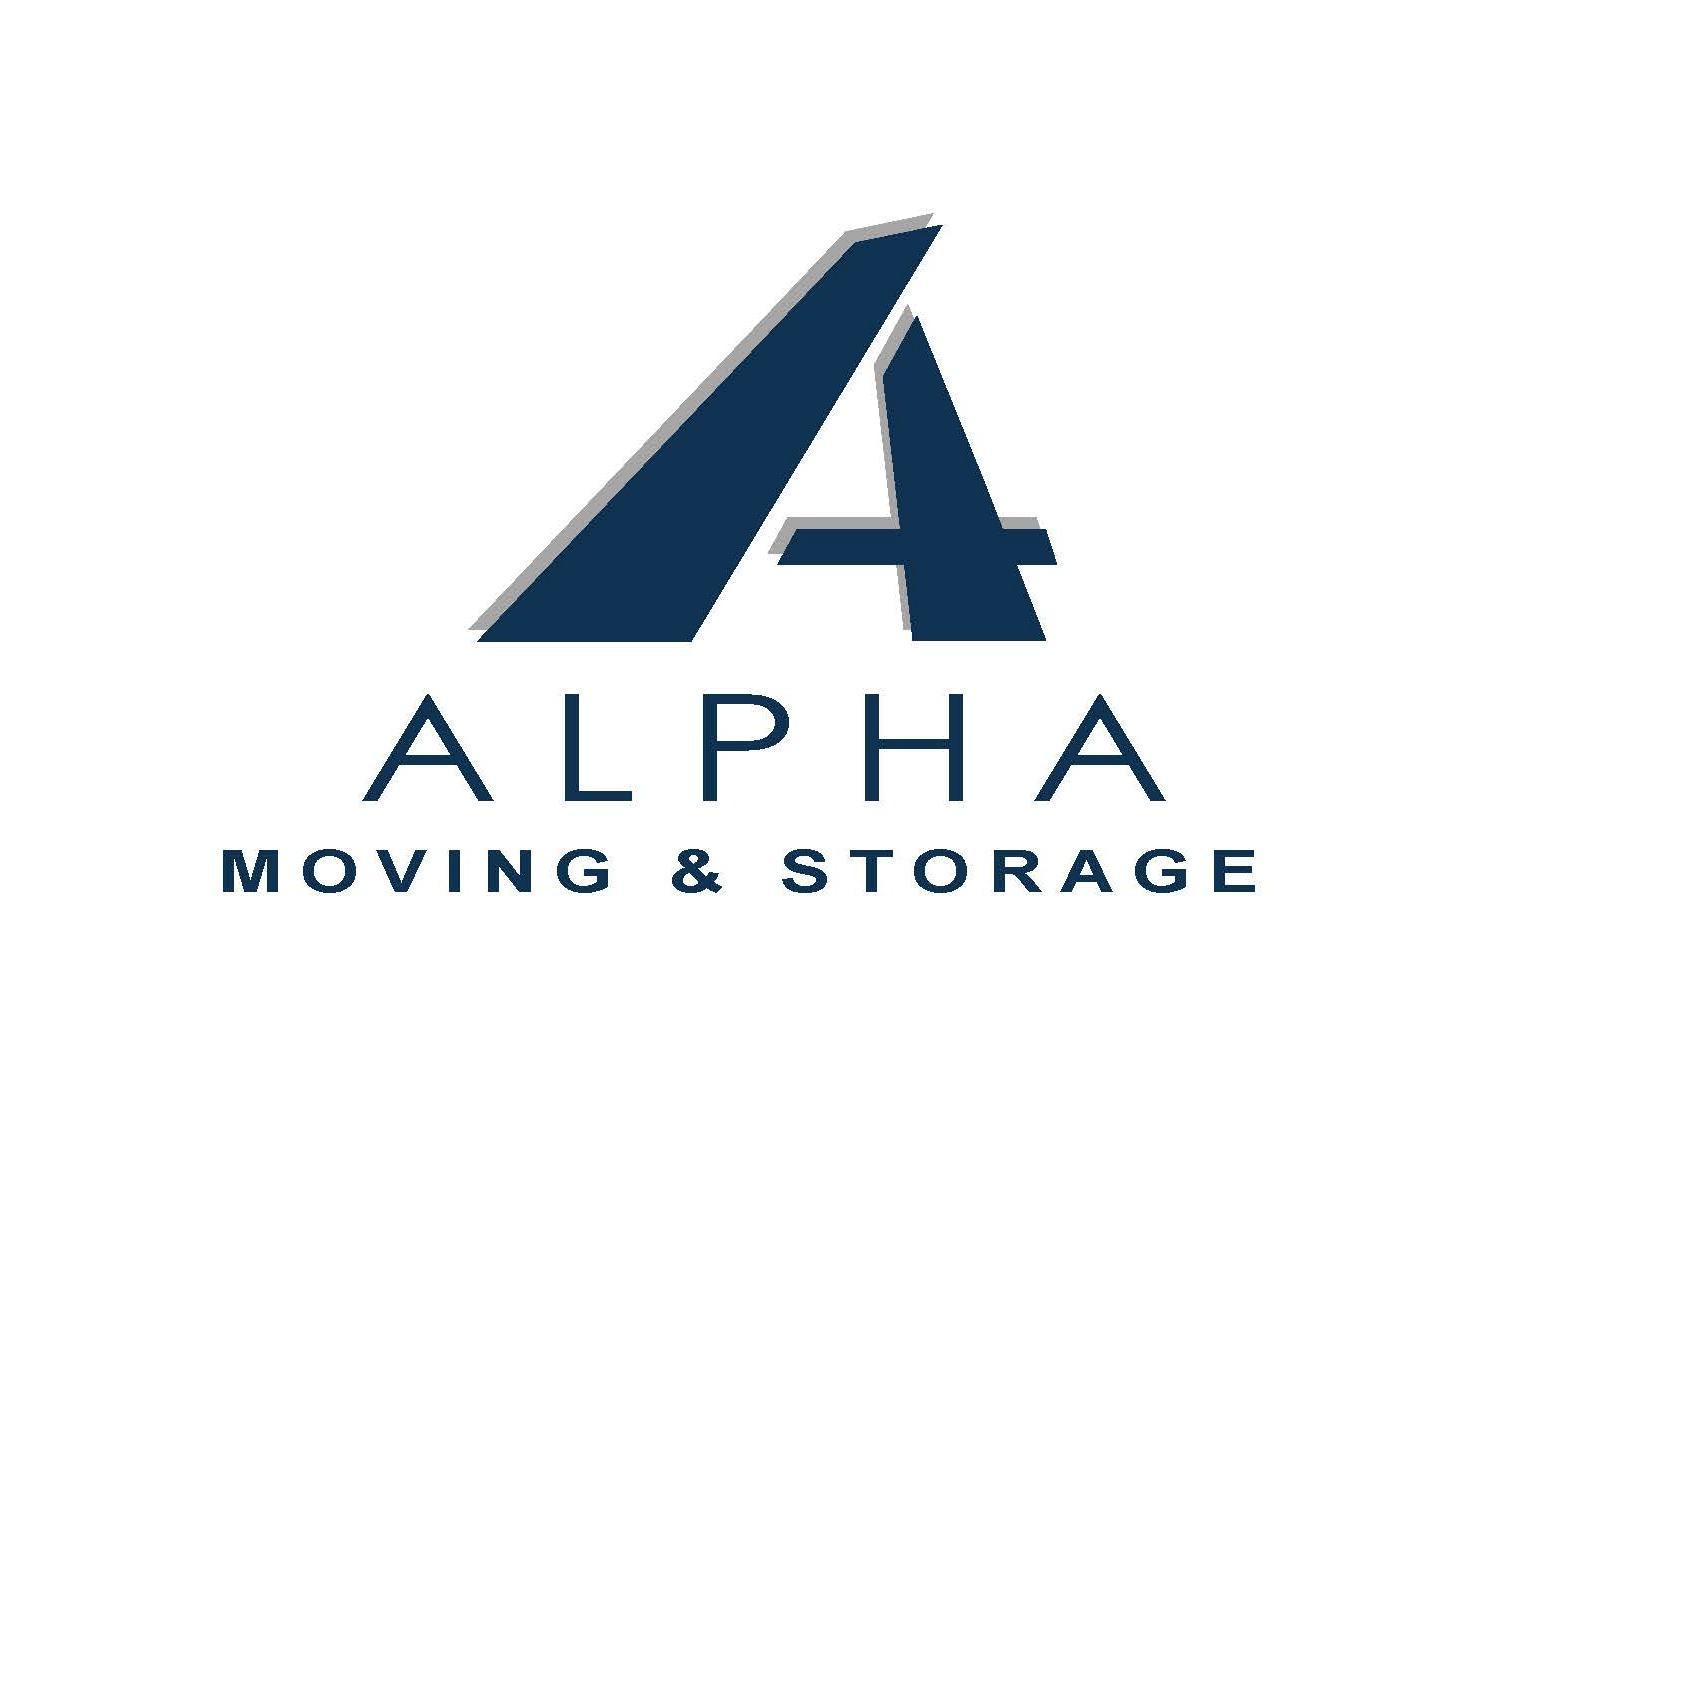 Alpha Moving & Storage